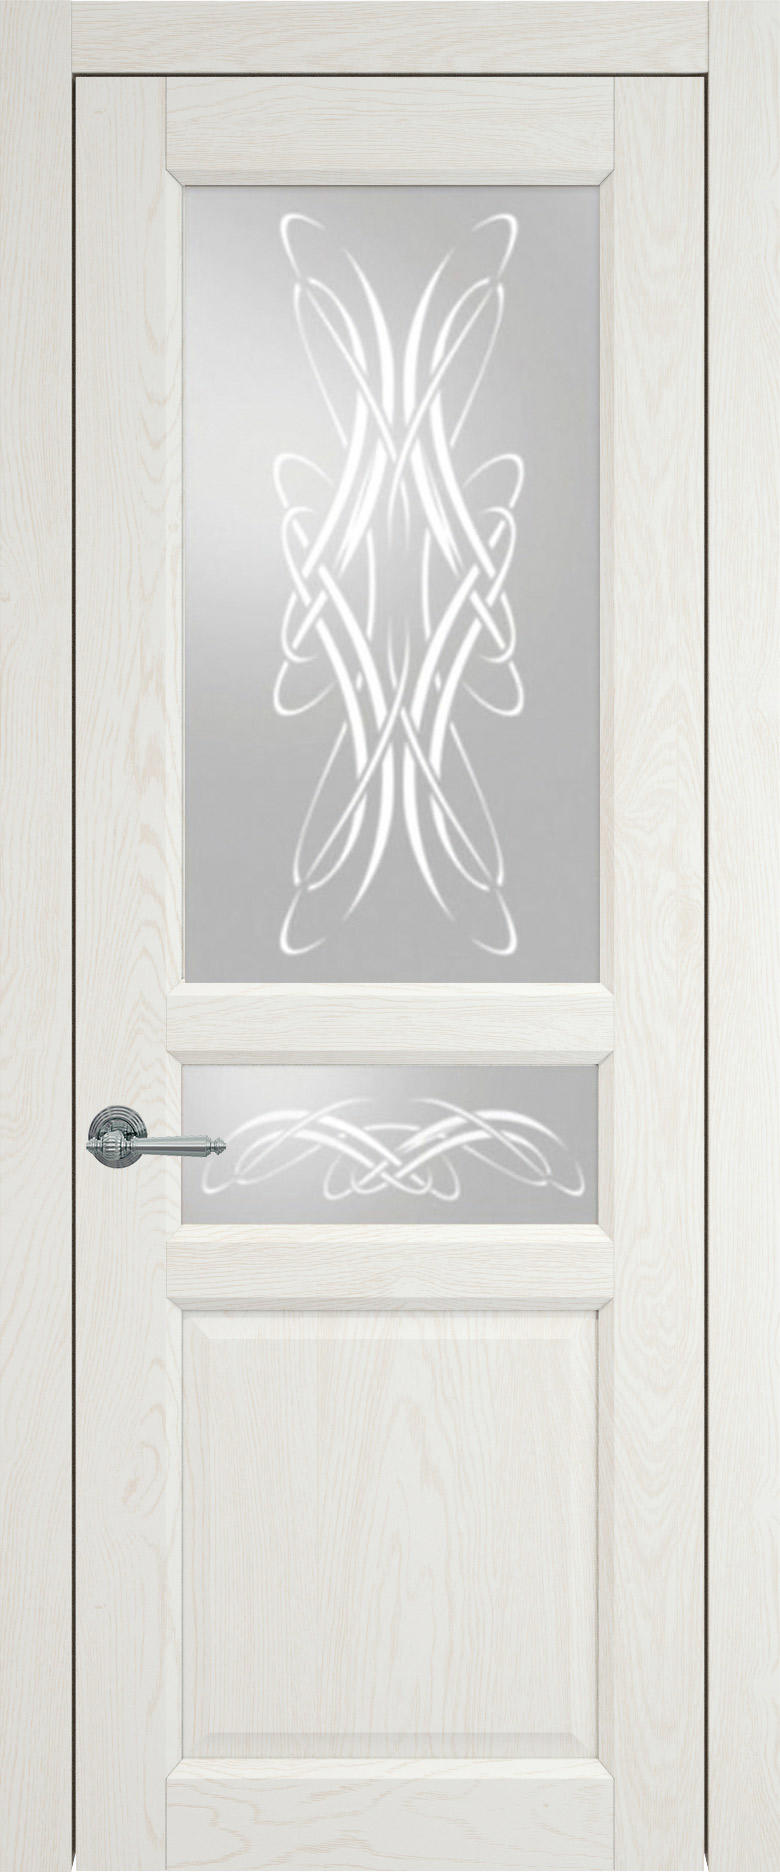 Imperia-R цвет - Белый ясень (nano-flex) Со стеклом (ДО)